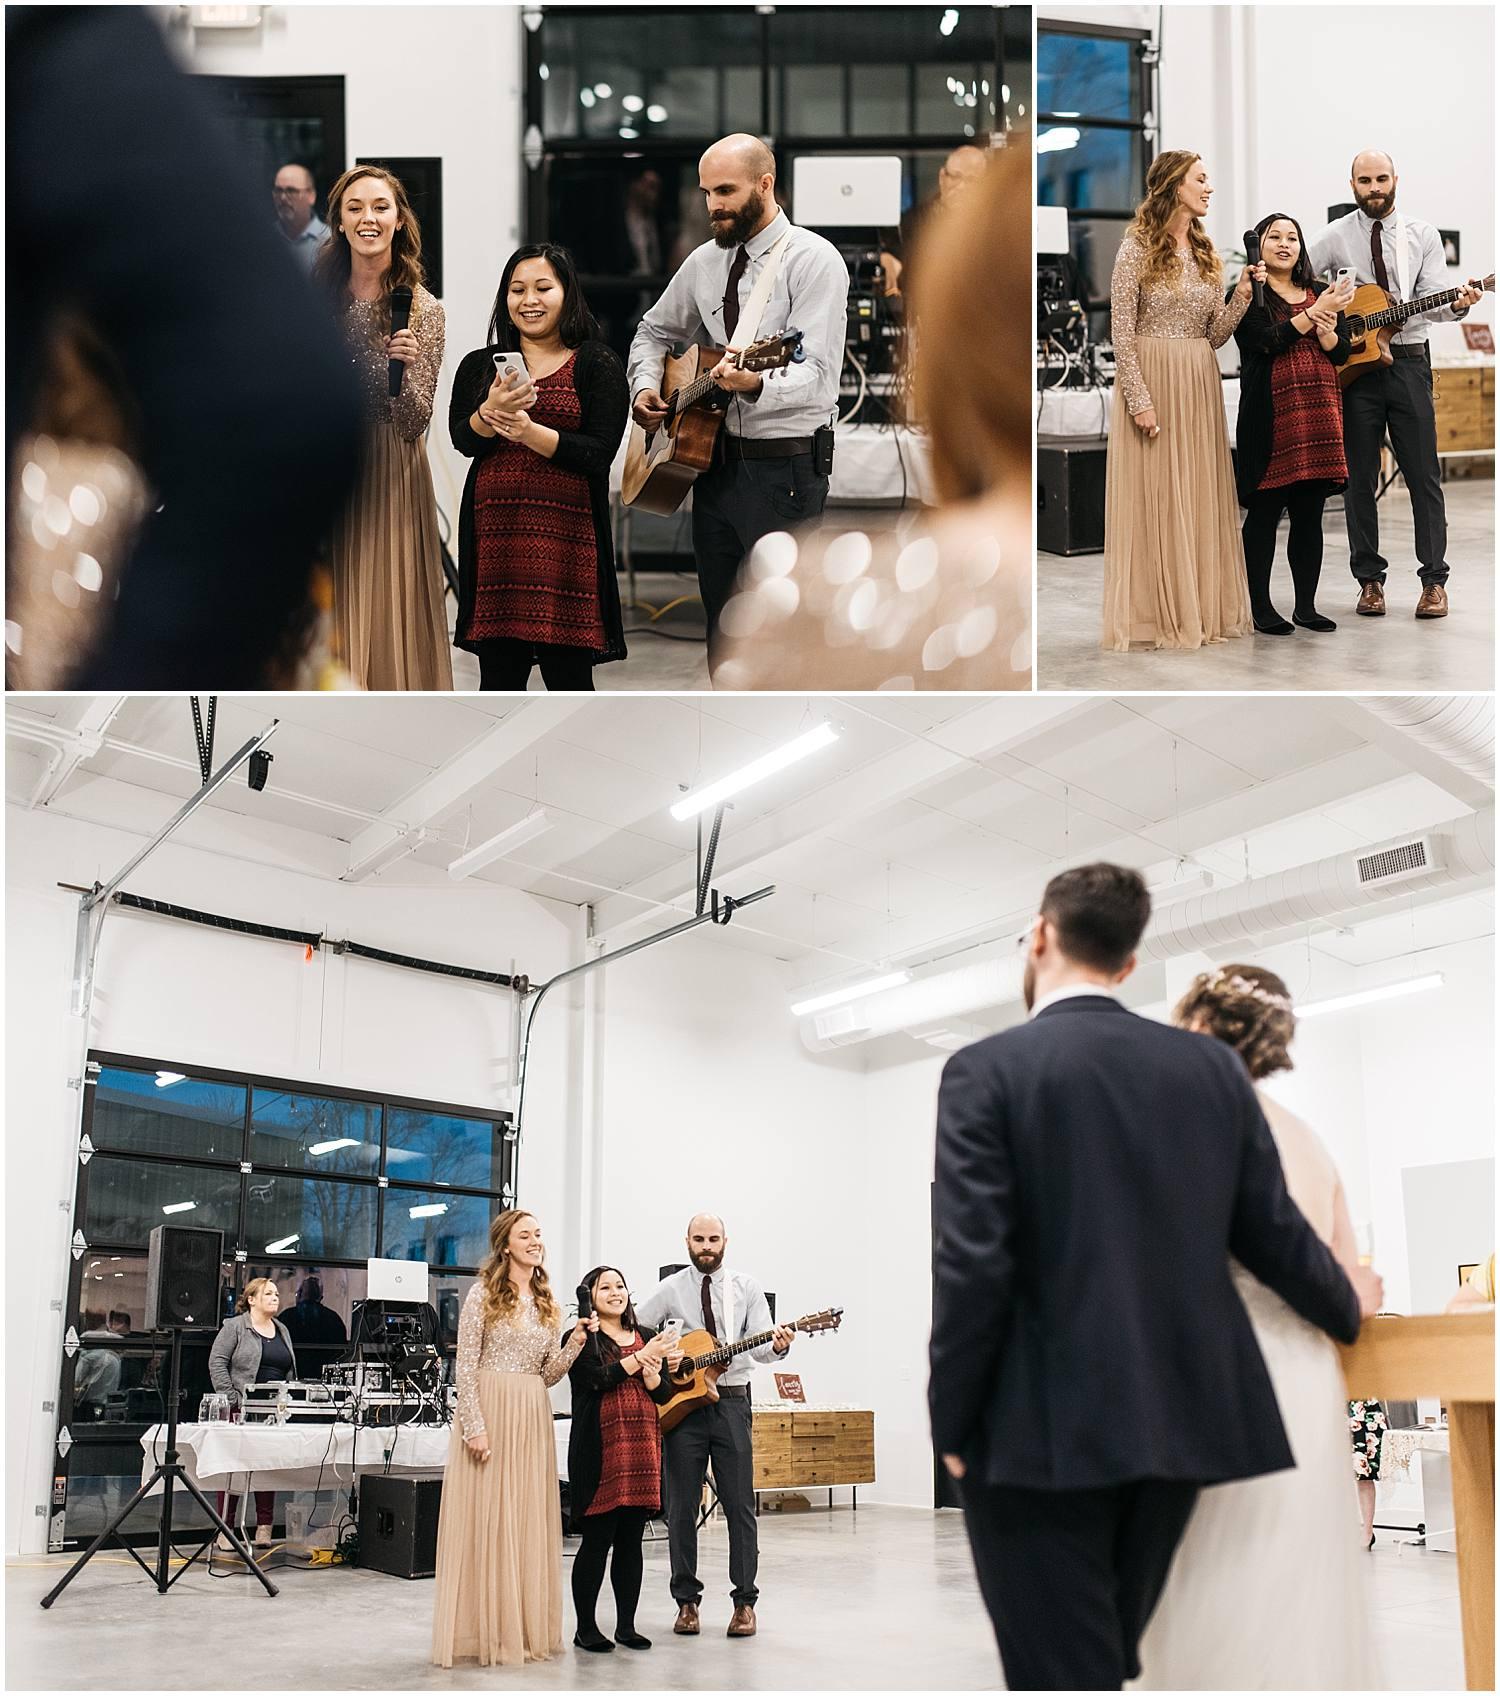 Josh - Emily - wedding - supply manheim- www.gabemcmullen.com133.jpg